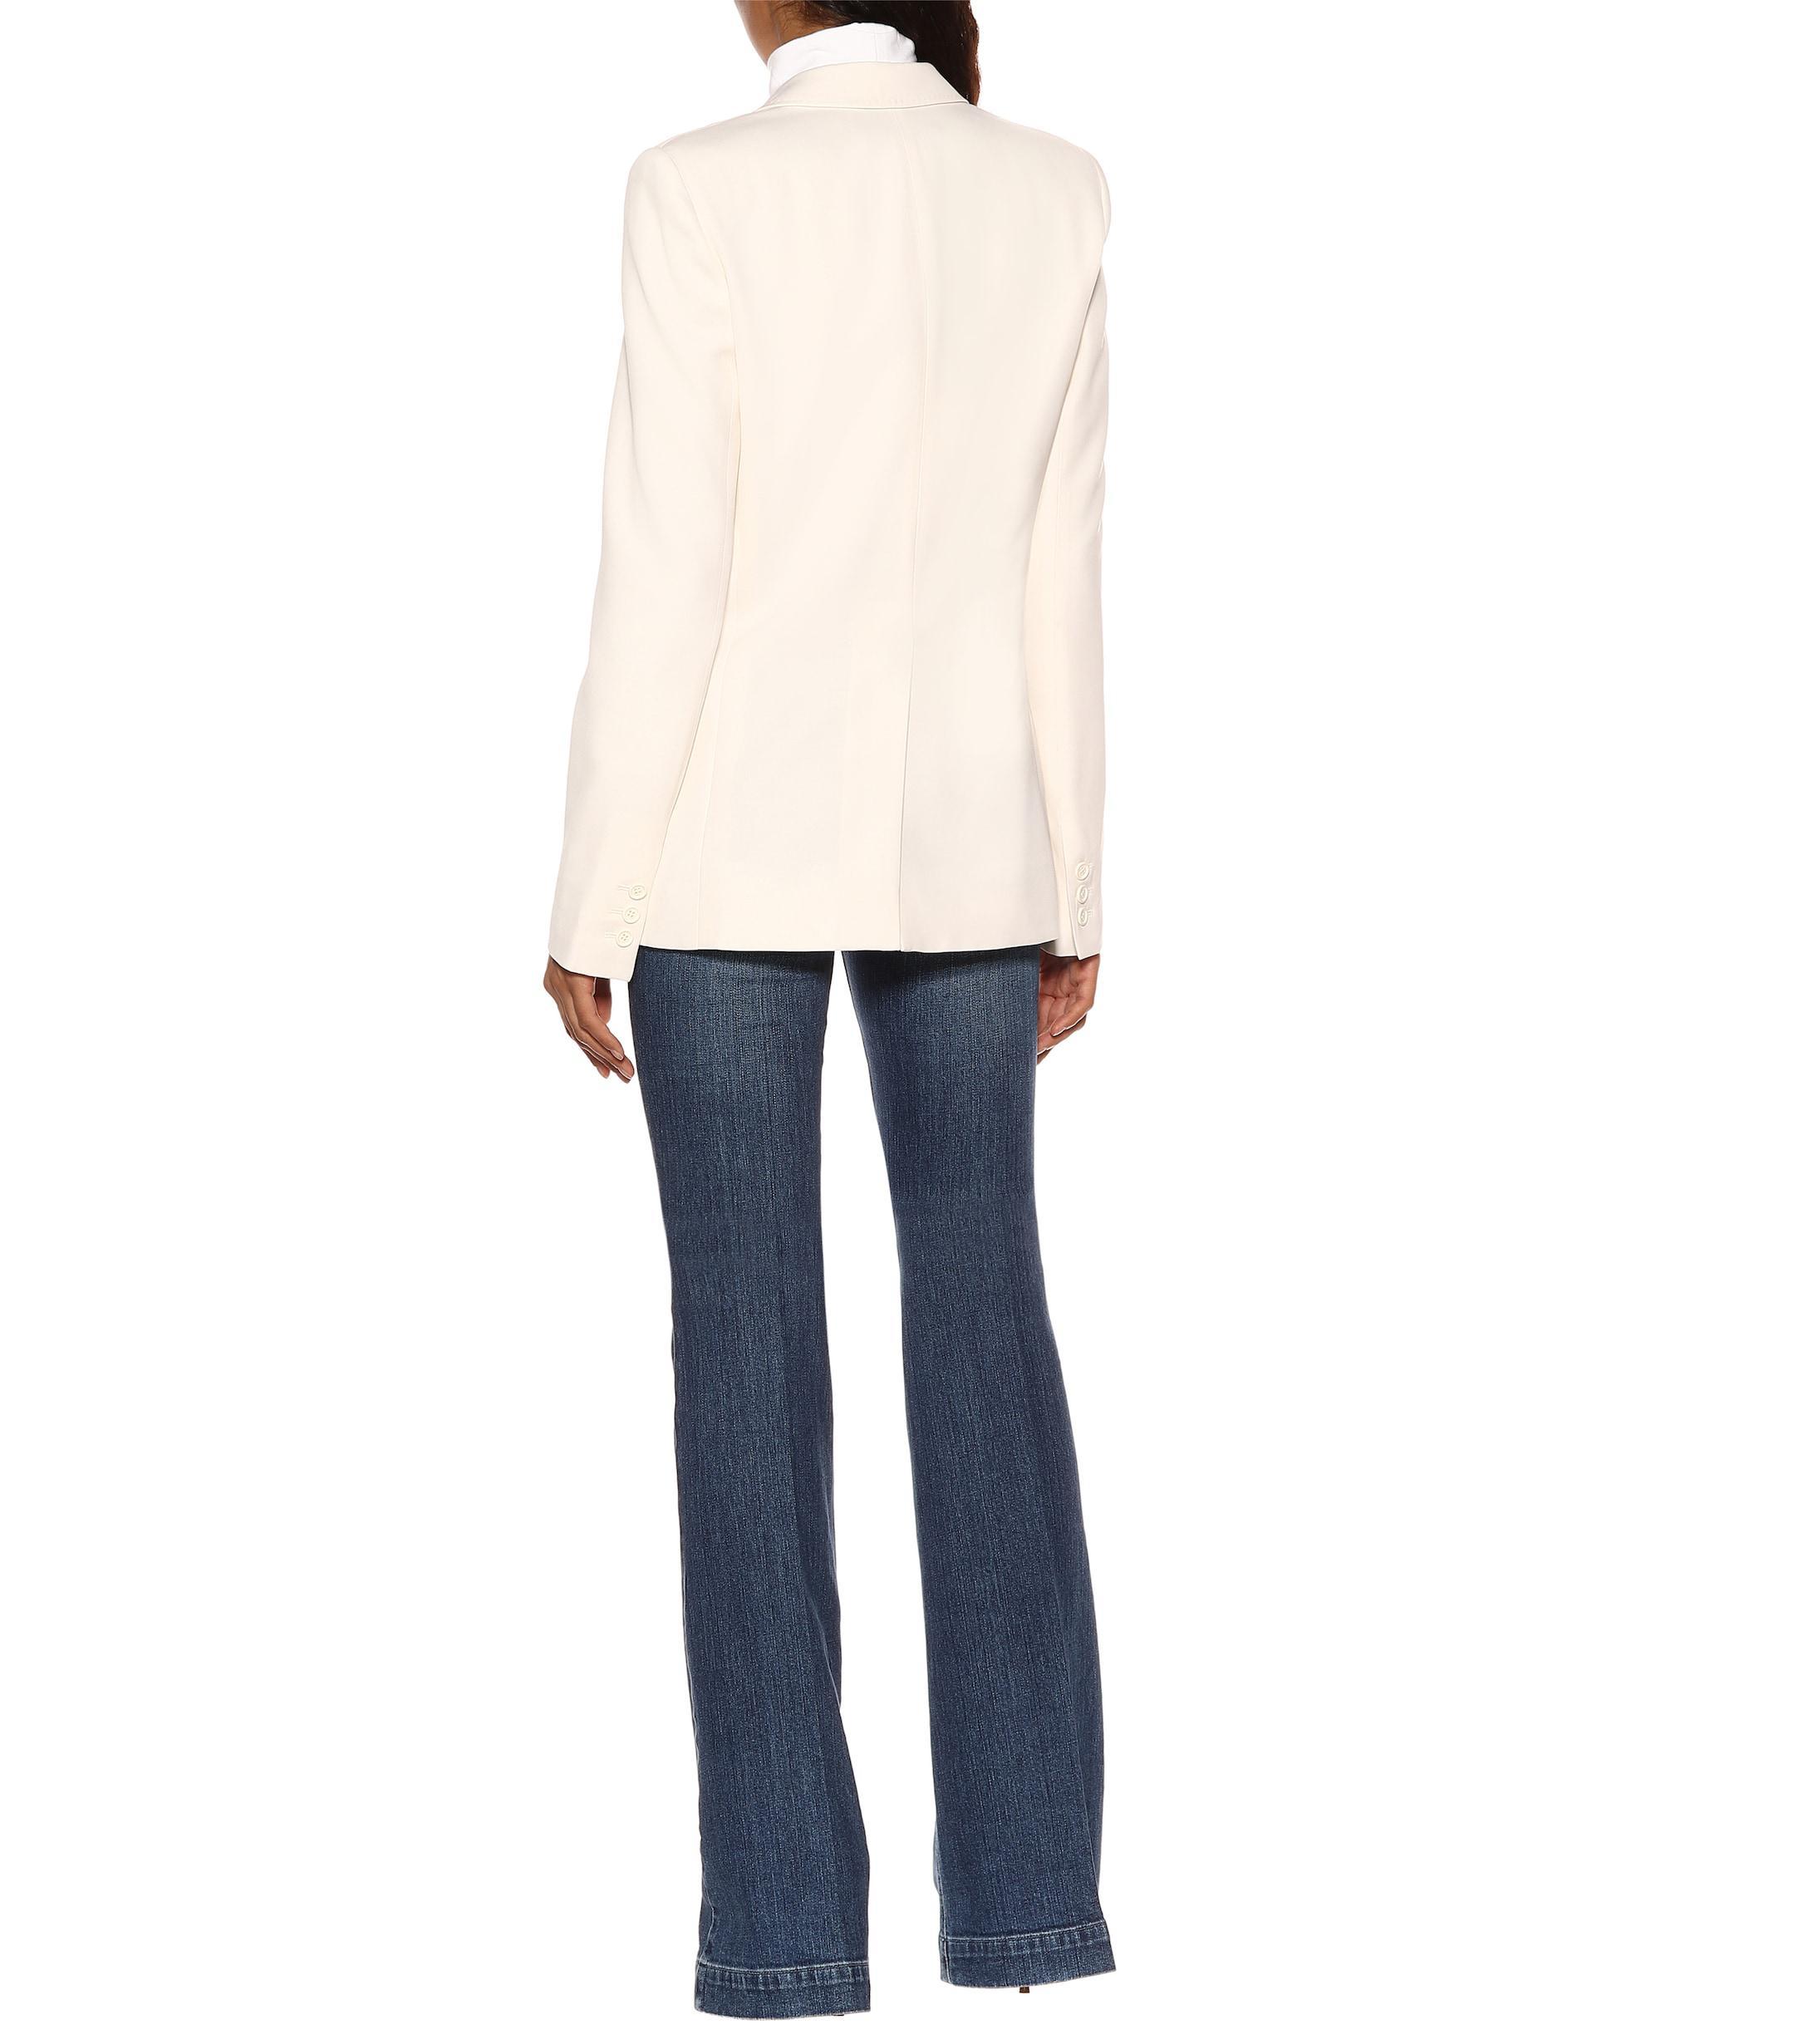 Blazer de lana Stella McCartney de color Blanco